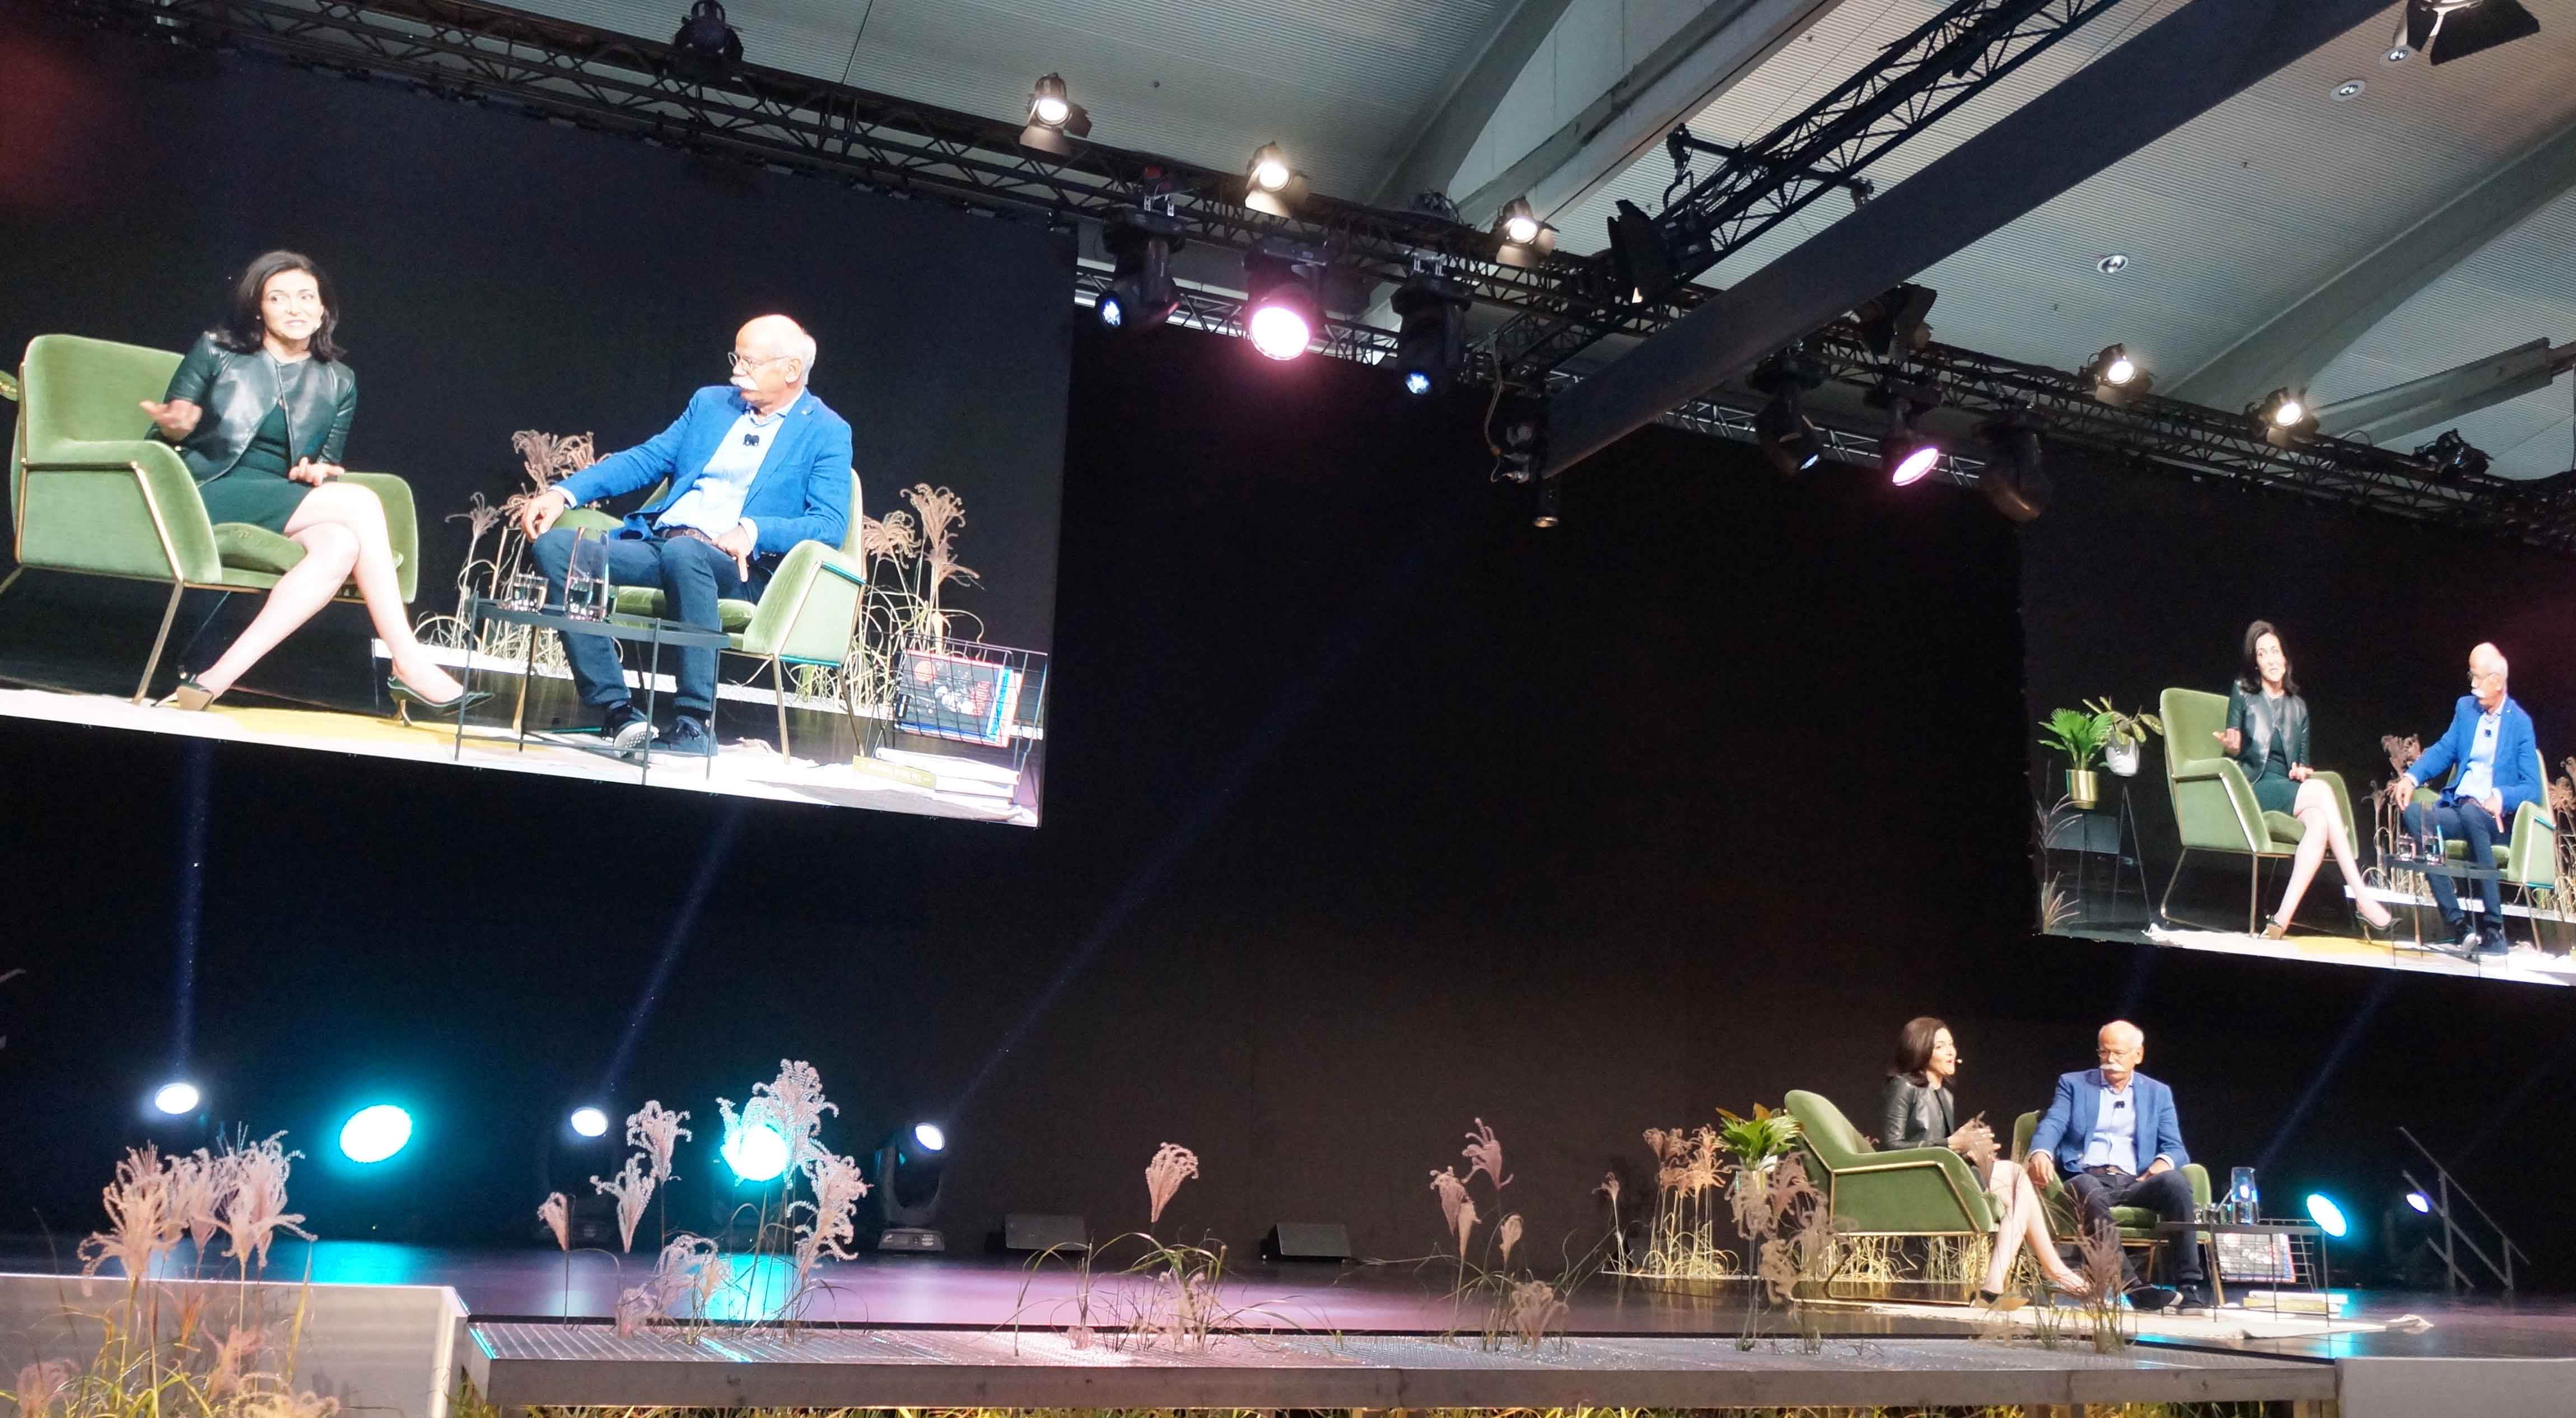 Sheryl Sandberg, Facebook, Dieter Zetsche, Daimler Benz AG, me Convention 2017, IAA, Frankfurt am Main, Bild: Jürgen Schultheis